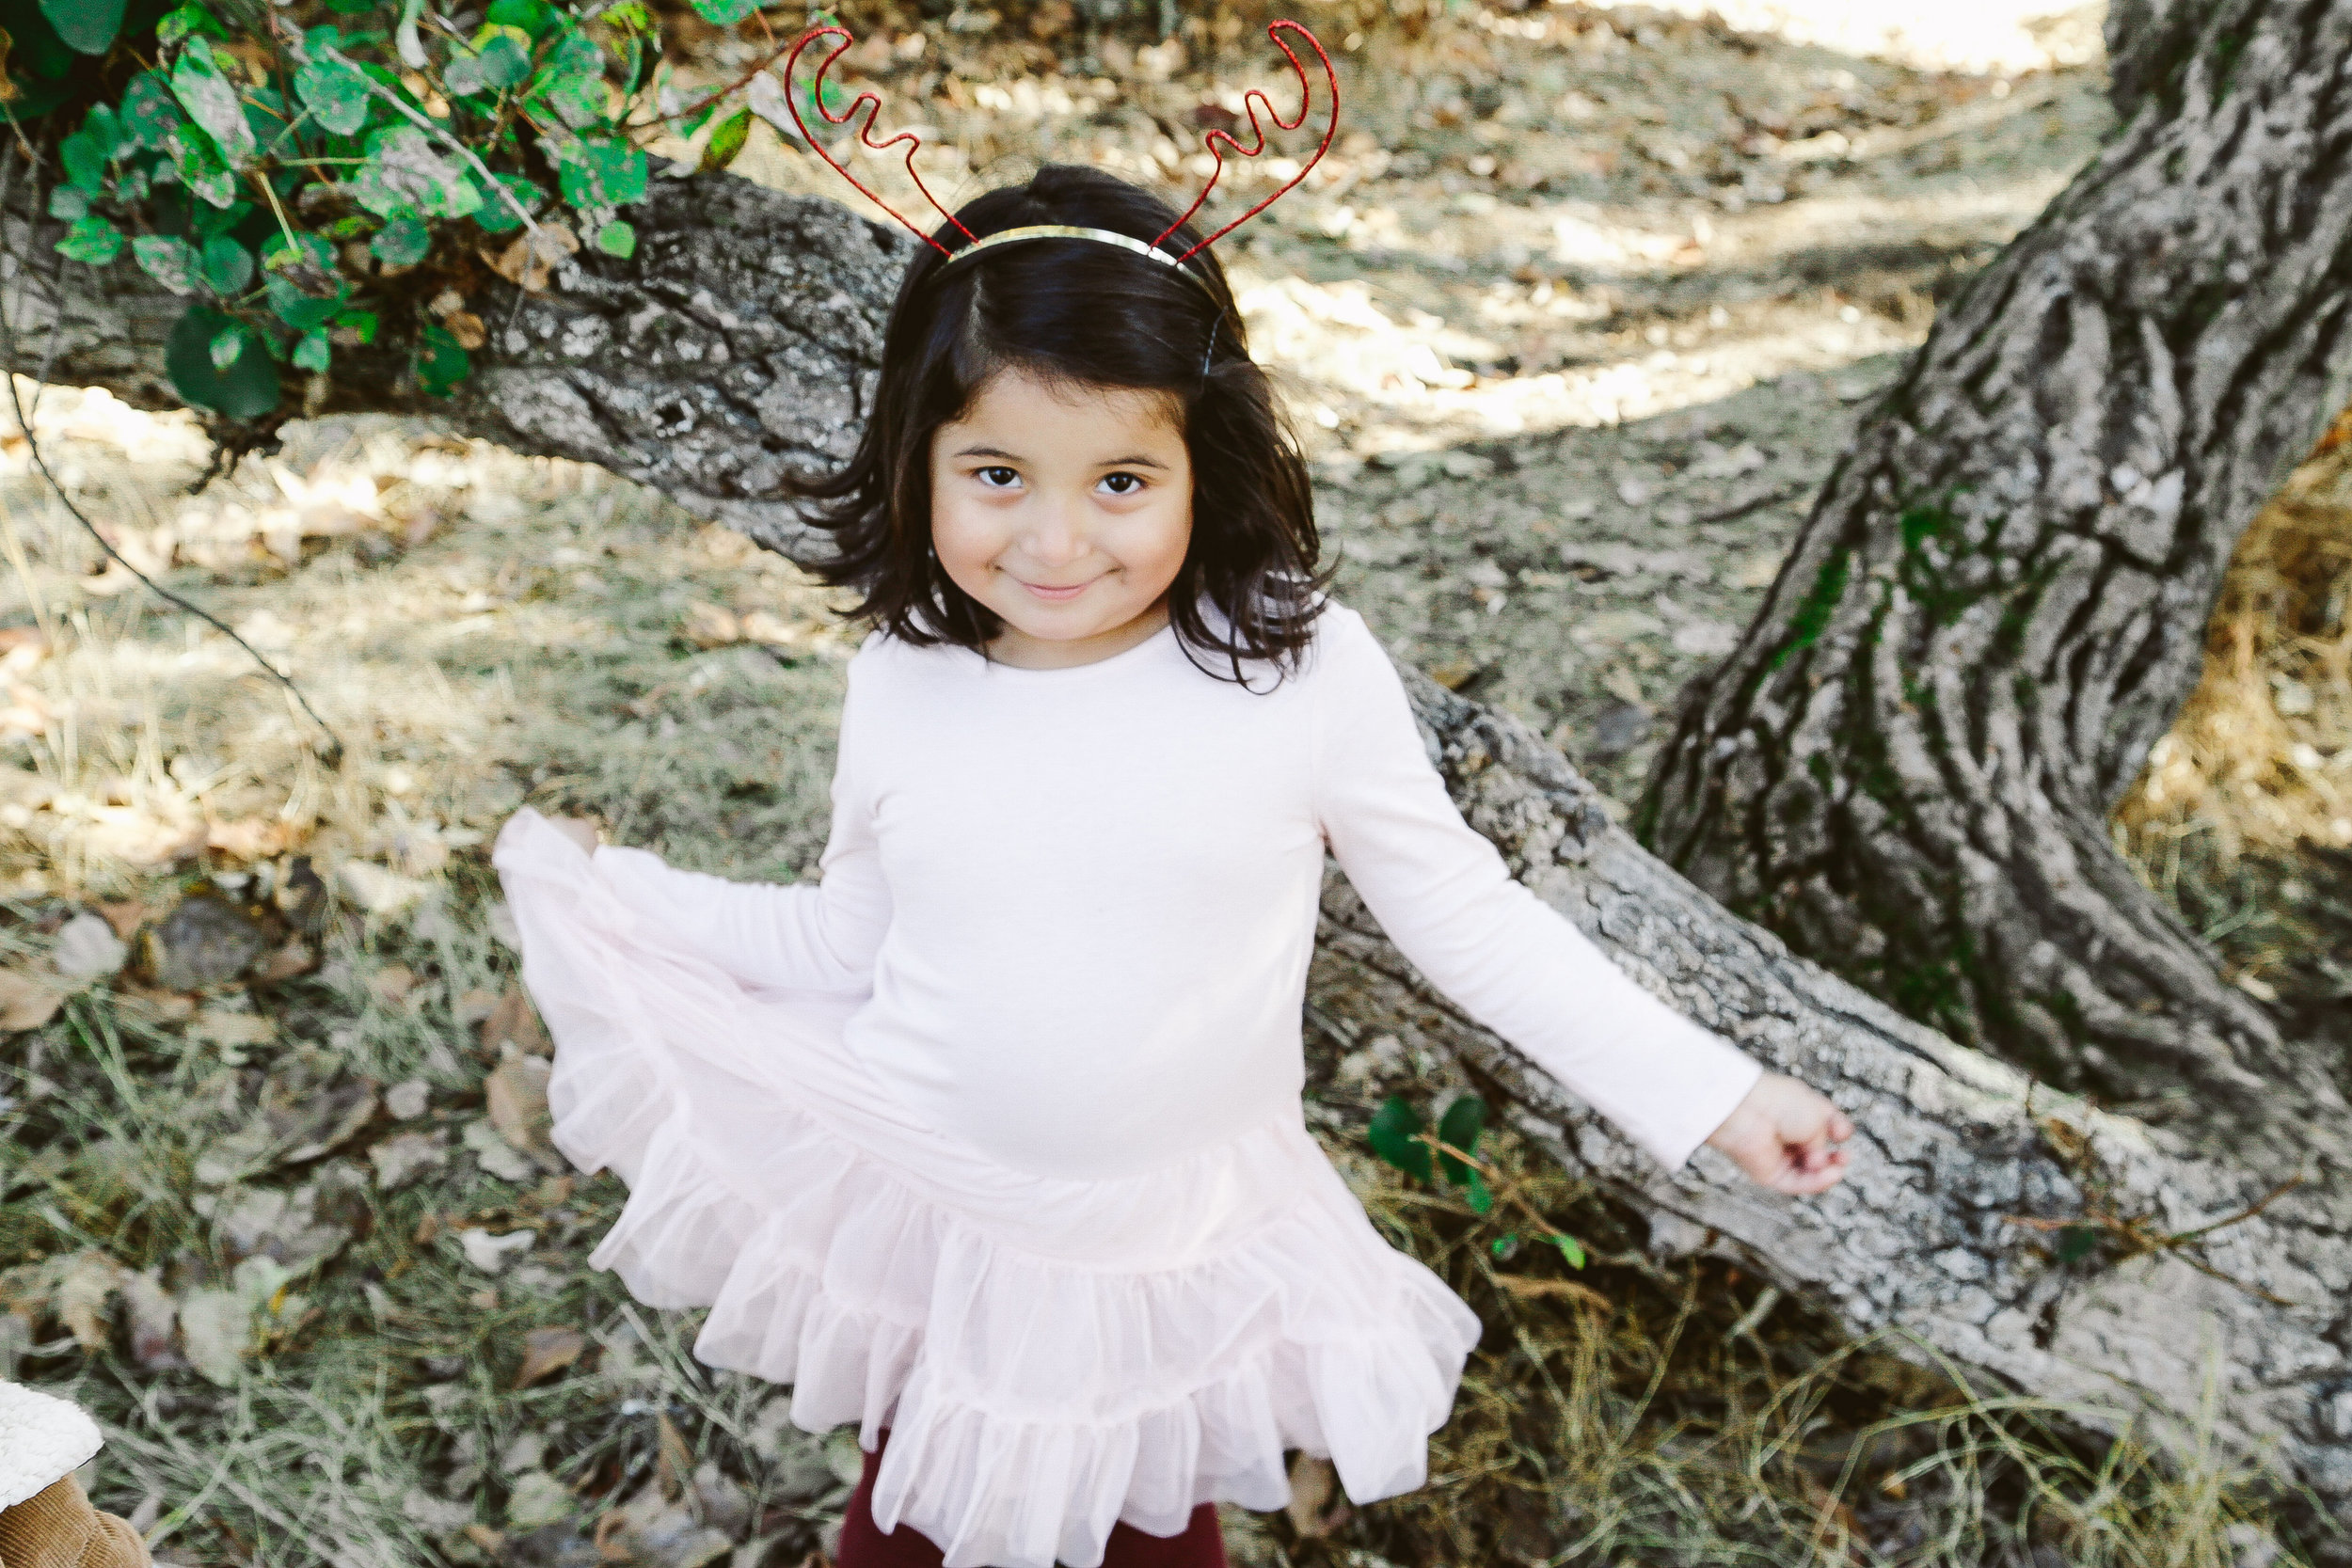 Dominguez Family Christmas 2015-Dominguez Christmas Famliy Final-0311.jpg